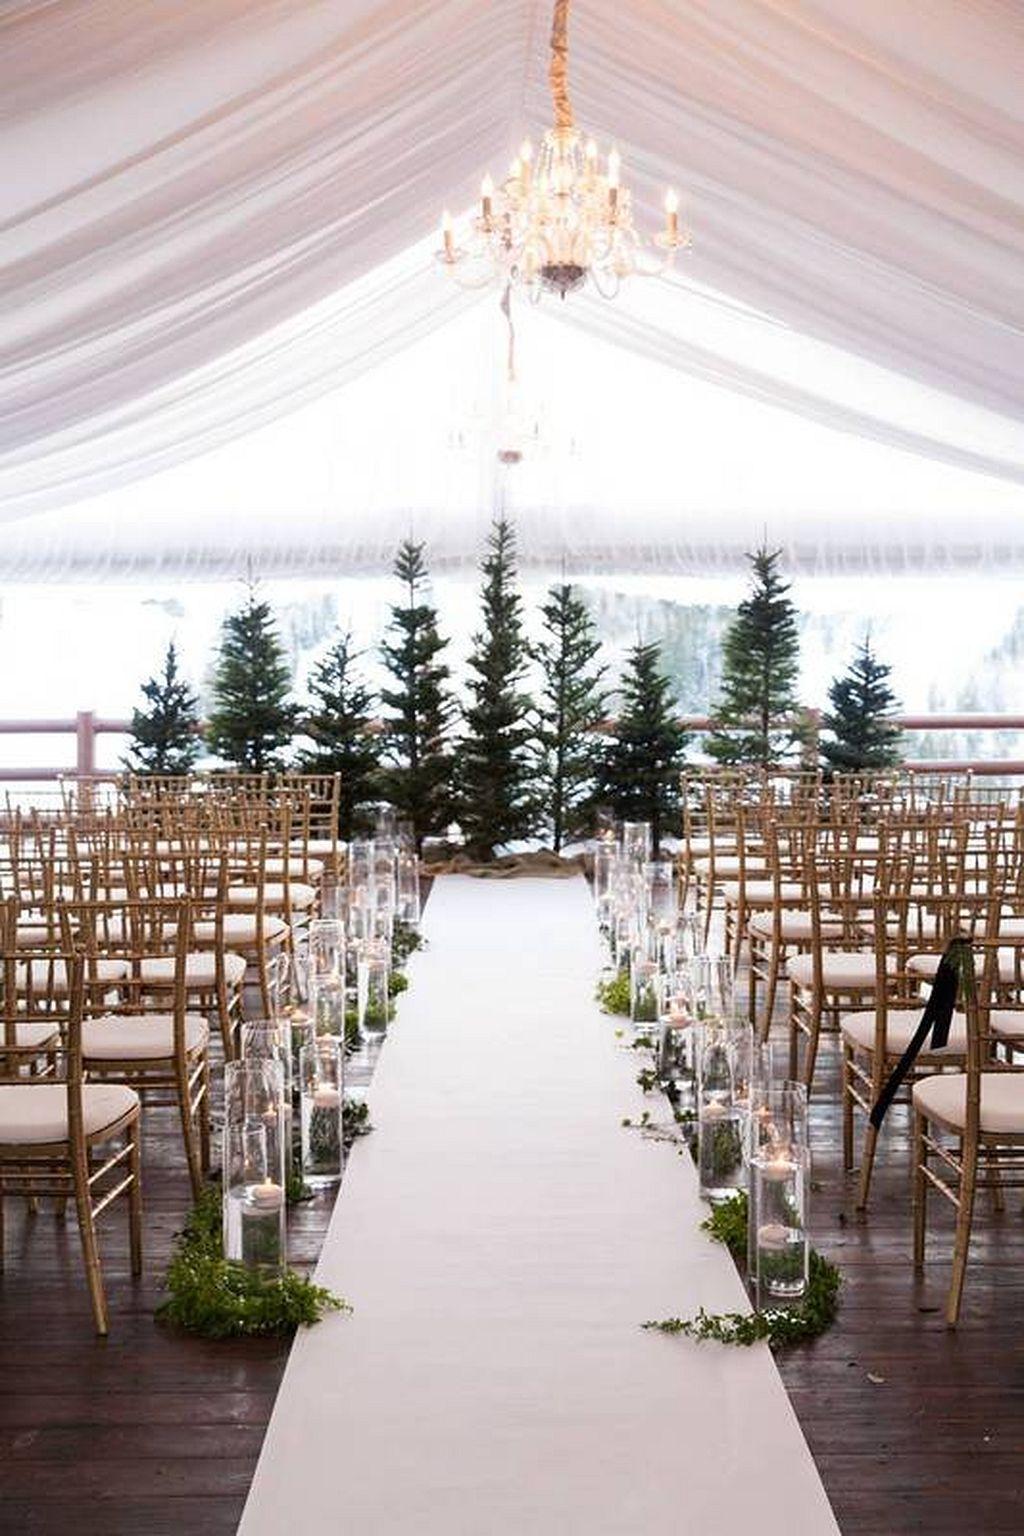 80 wedding aisle decoration ideas pinterest decoration weddings cool 80 wedding aisle decoration ideas httpsweddmagz80 wedding aisle decoration ideas junglespirit Images